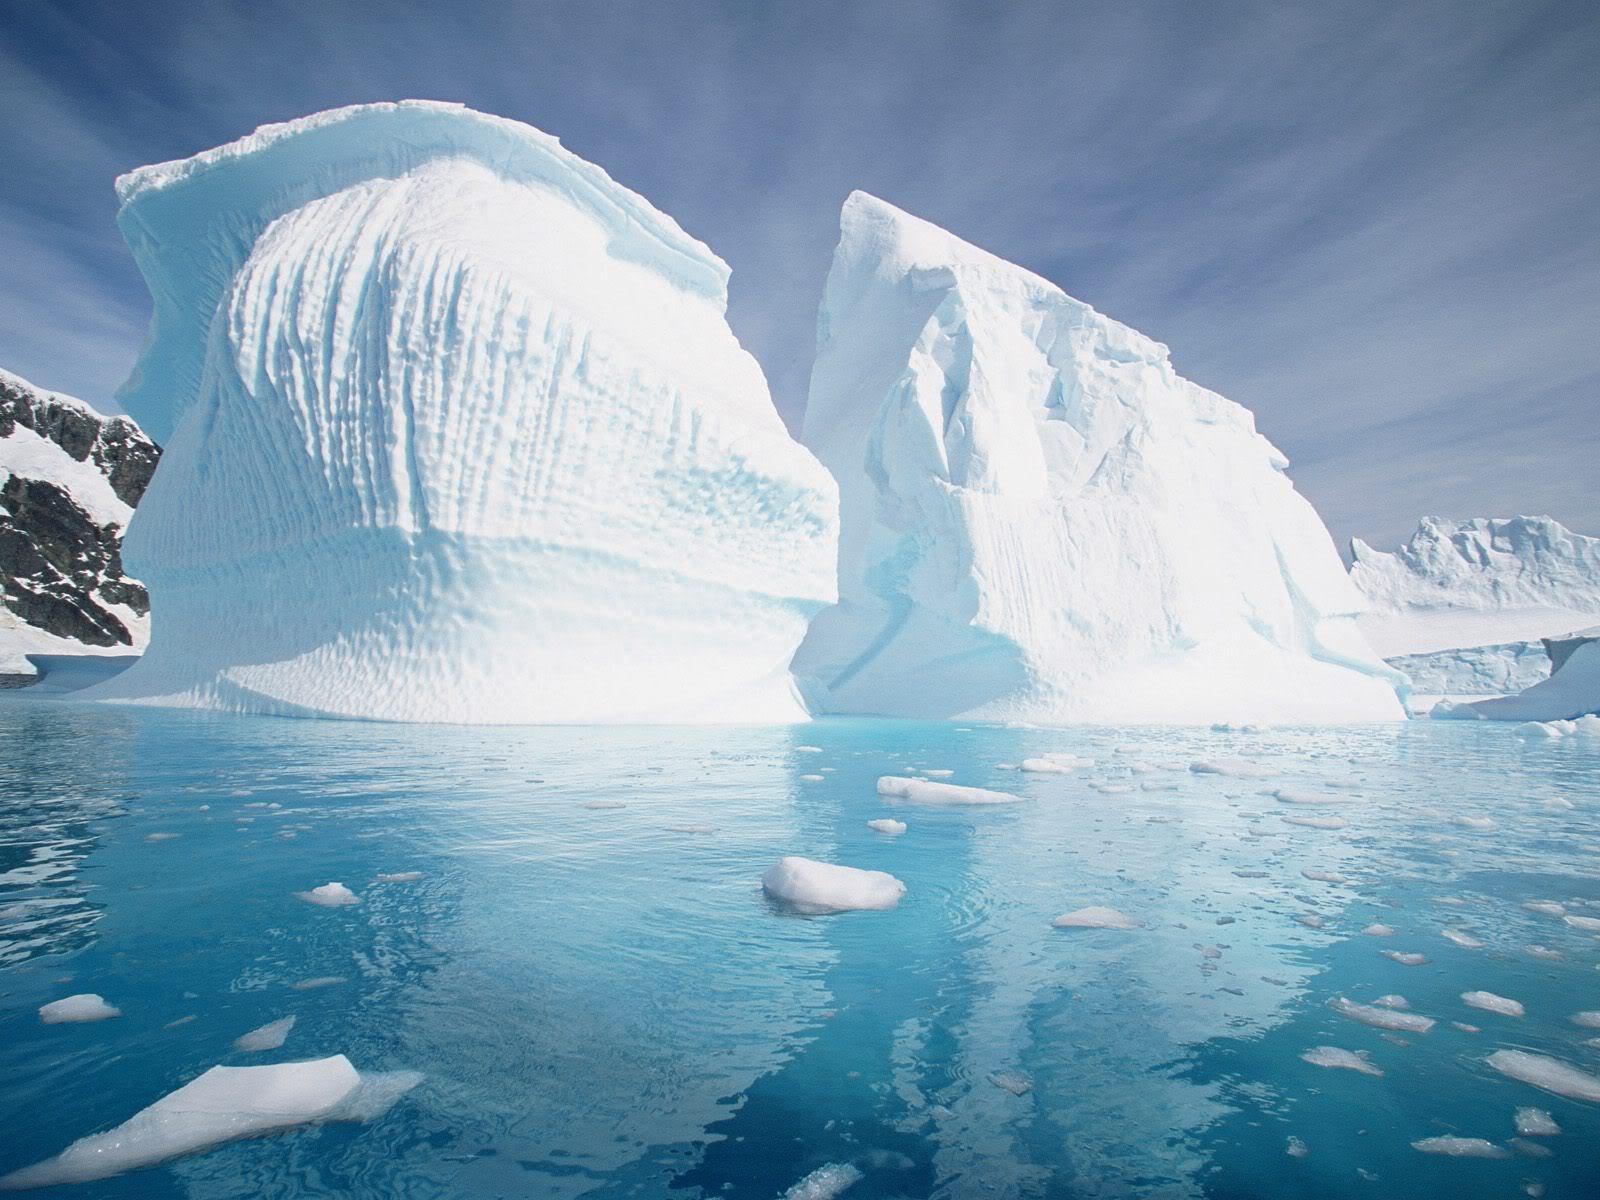 Gumpalan raksasa es Antartika merekah setelah terjadi gempa bumi Chili.